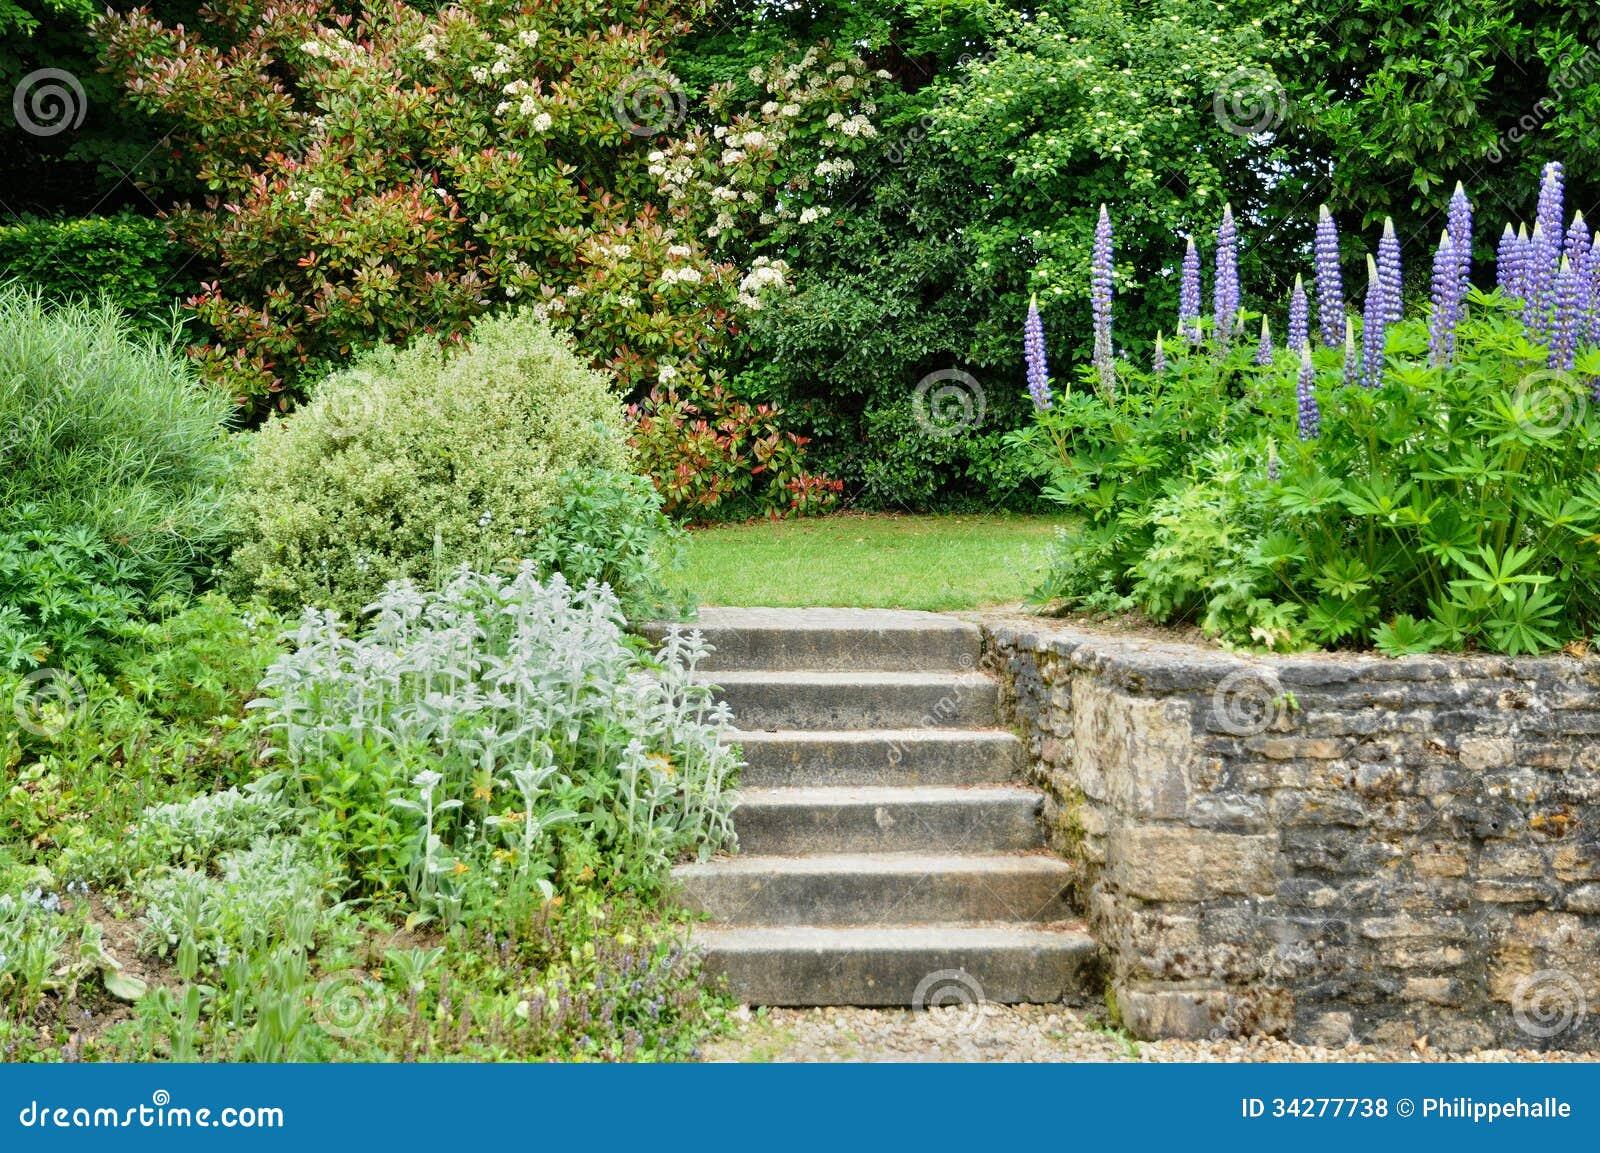 Les jardins du pays d auge in cambremer in normandie for Jardin jardinier normandie